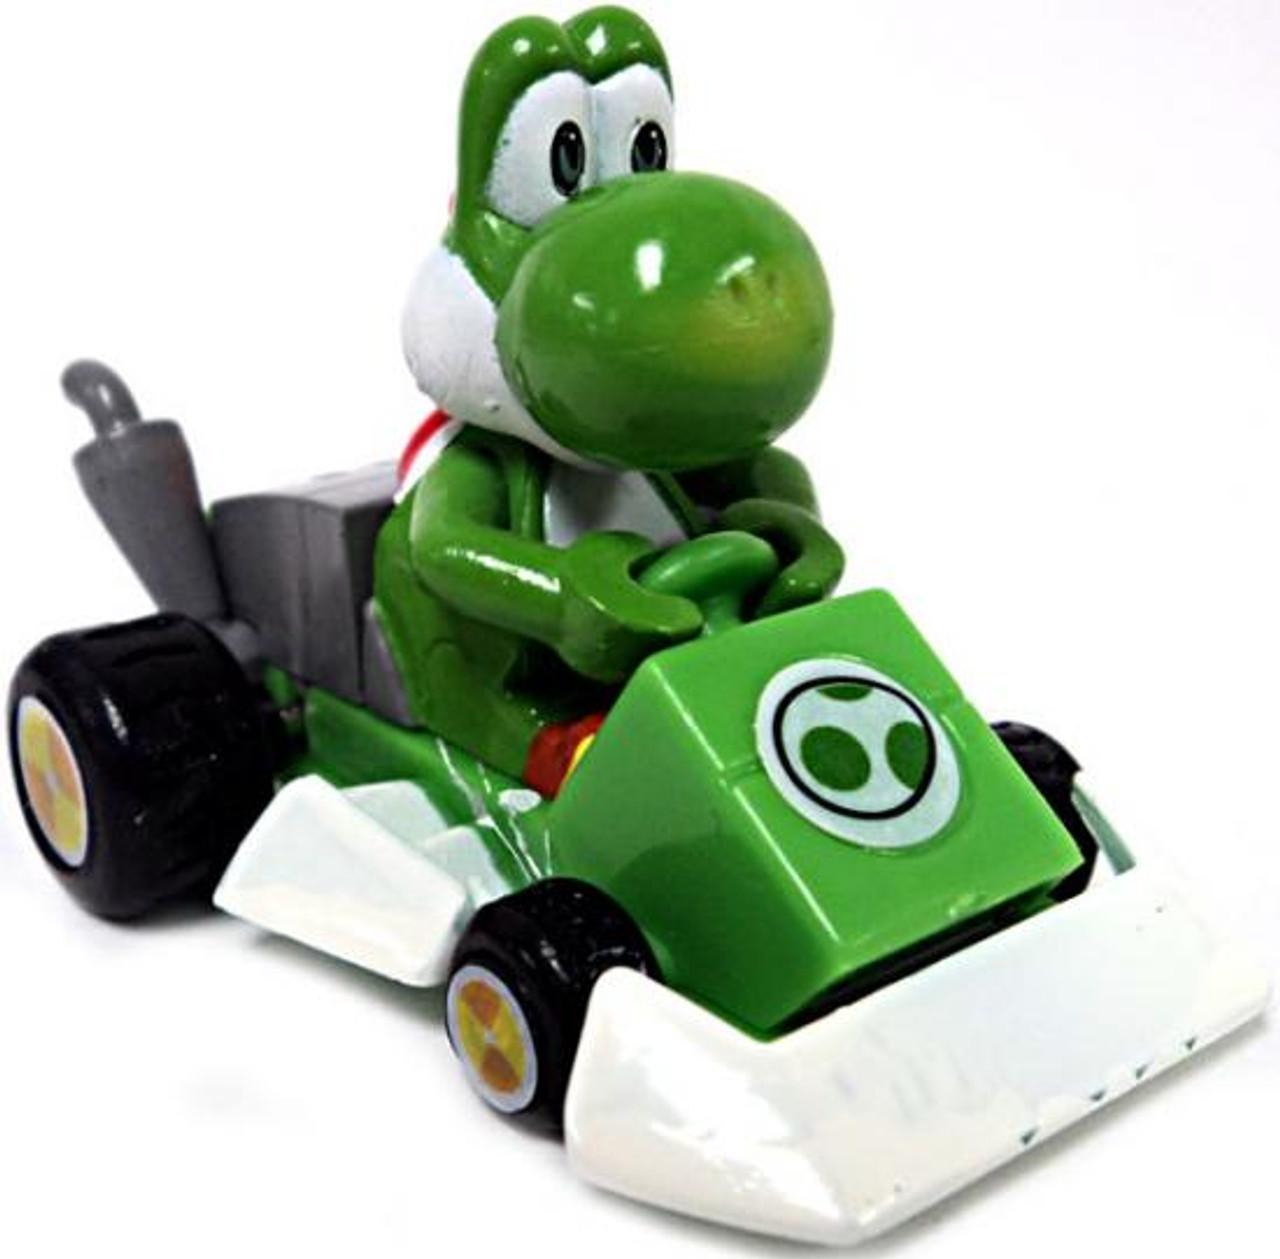 Super Mario Mario Kart Gacha Yoshi 1.5-Inch Pull Back Racer [Square Front Bumper]